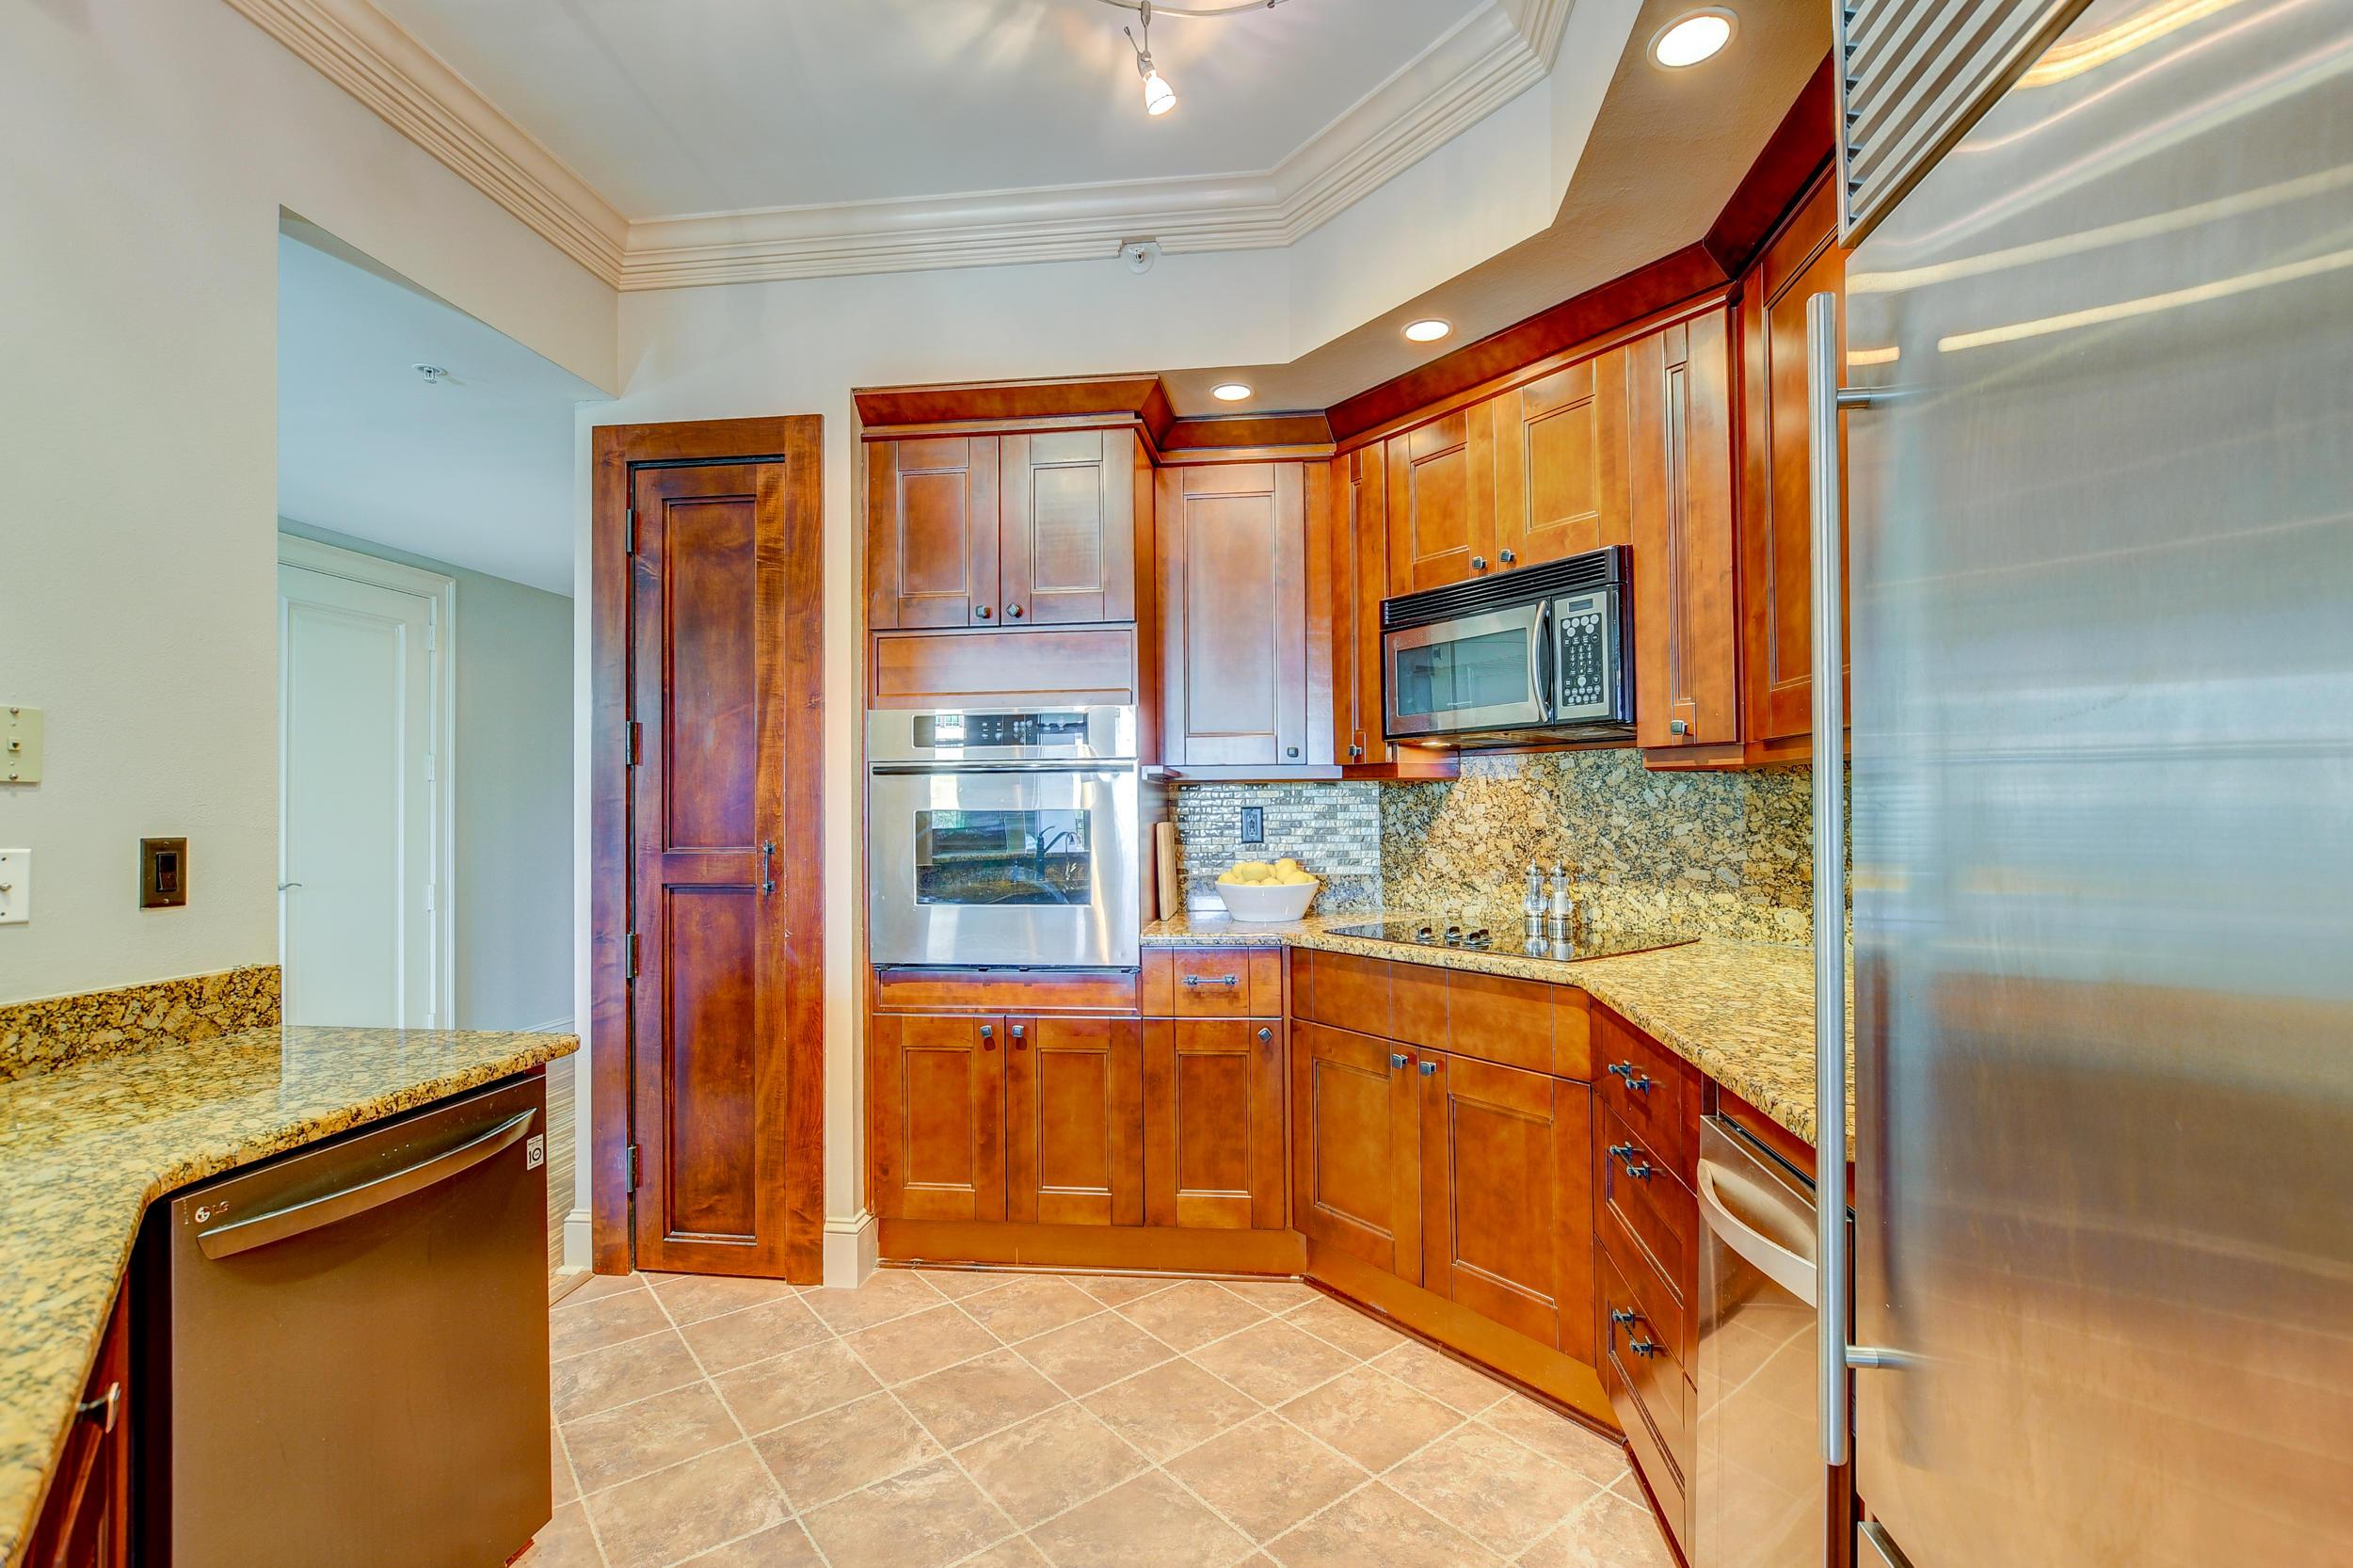 Renaissance On Chas Harbor Homes For Sale - 224 Plaza, Mount Pleasant, SC - 11